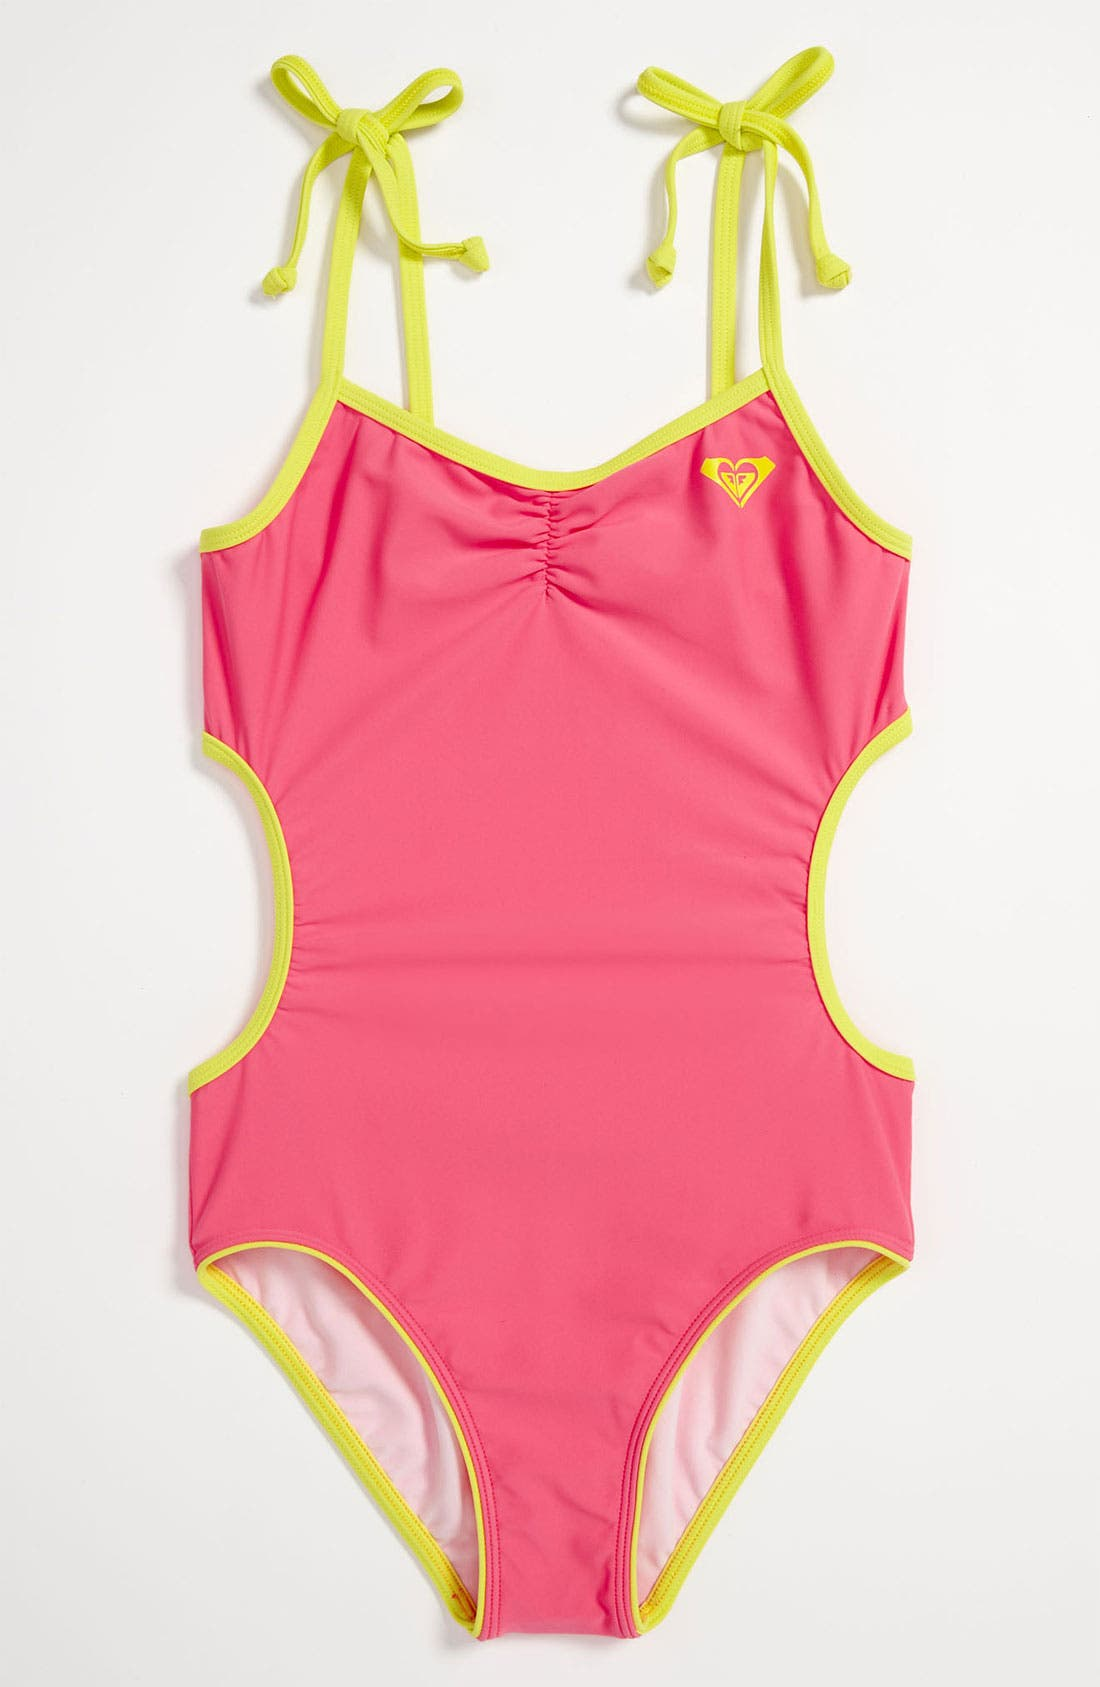 Alternate Image 1 Selected - Roxy One Piece Swimsuit (Big Girls)